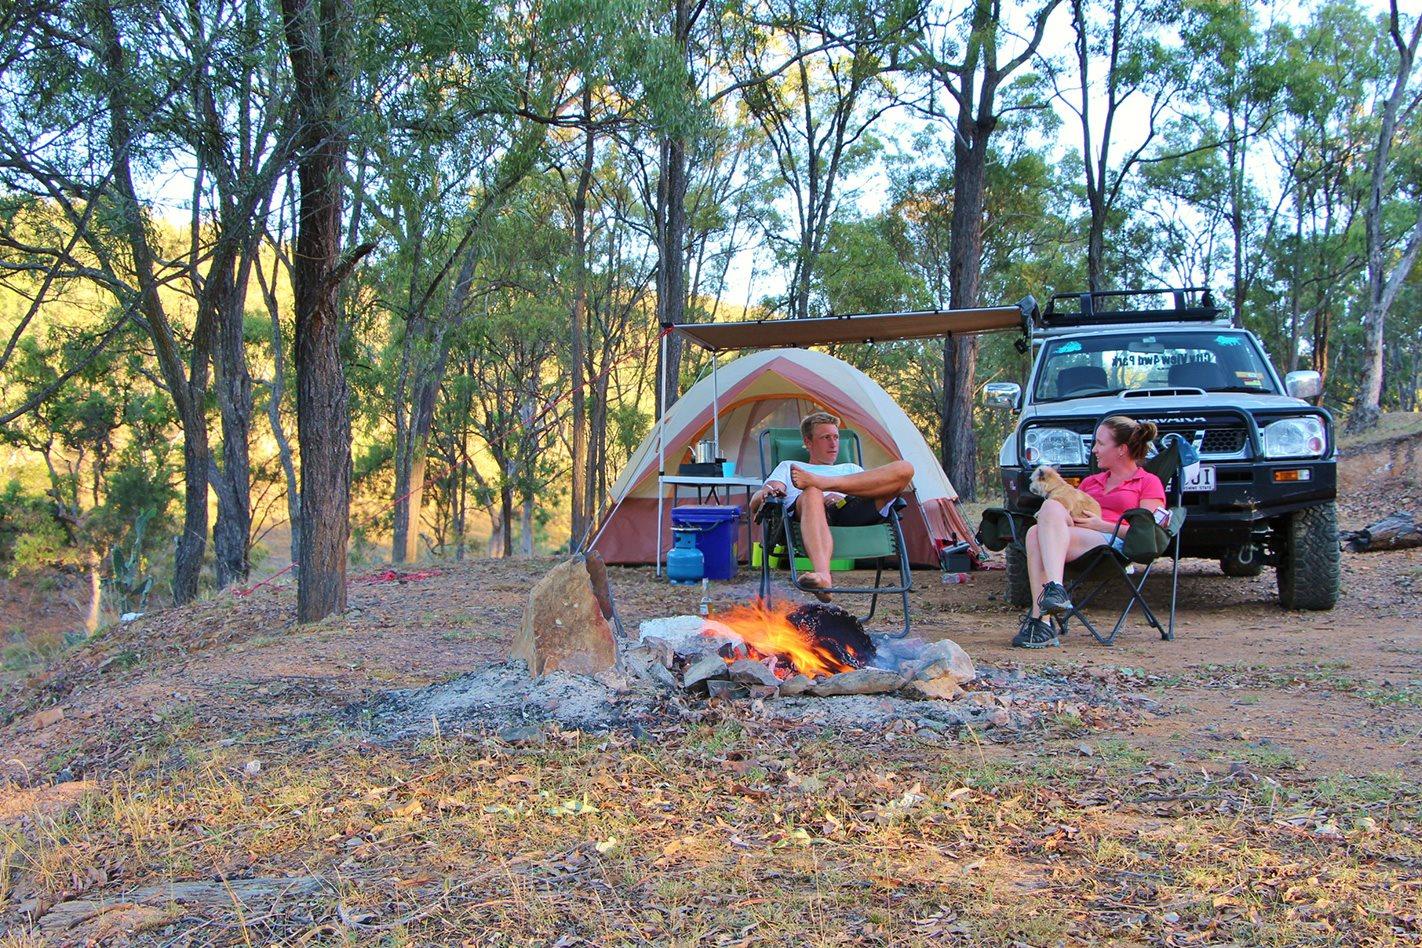 The Springs 4X4 Adventure Park campsite